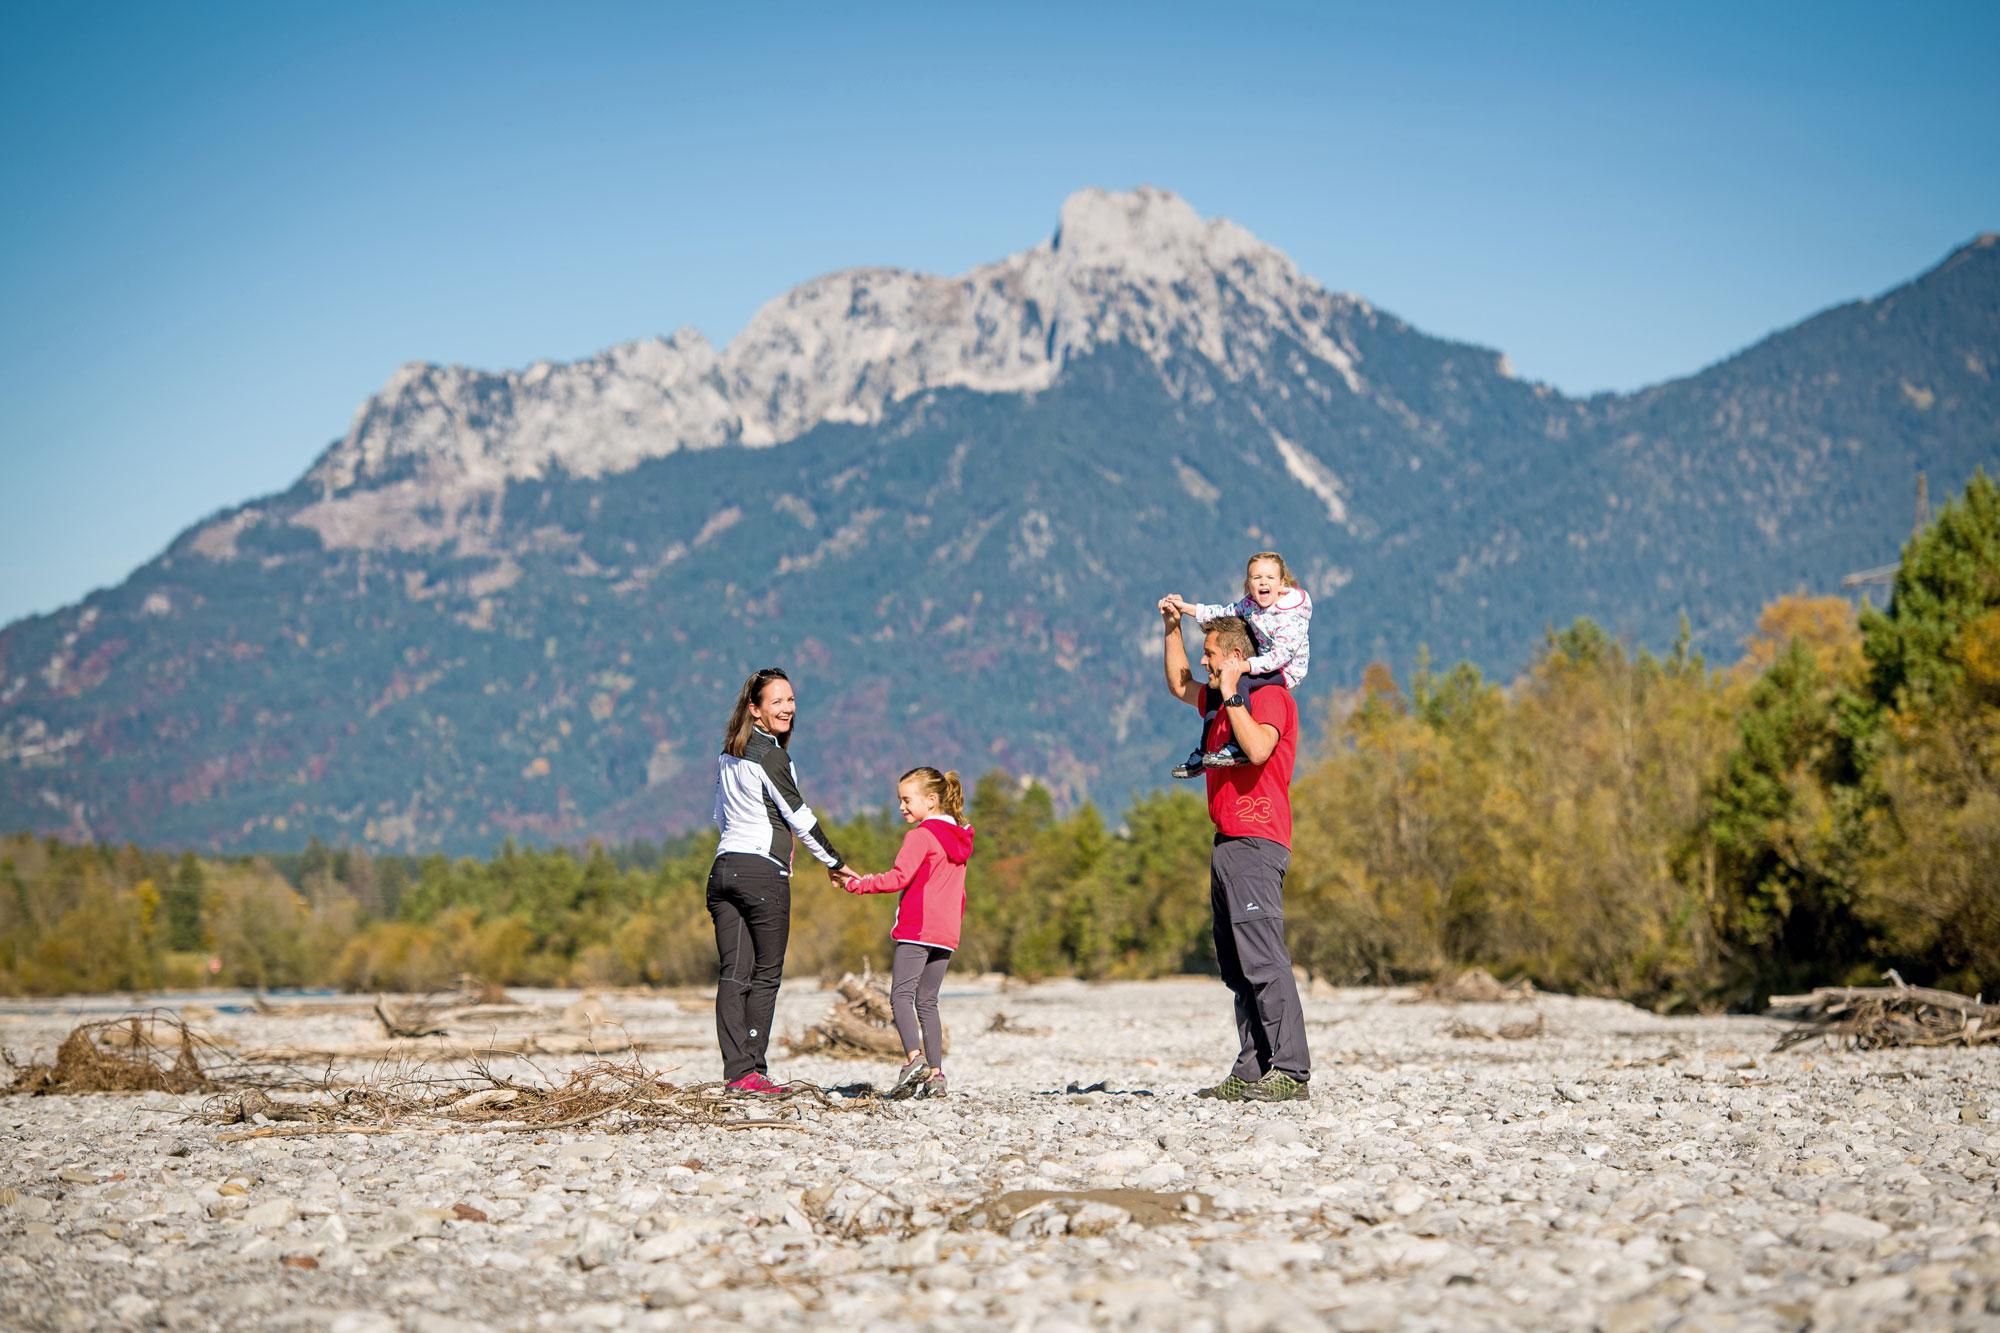 Eine Wanderung am Lech erfreut die ganze Familie © Naturparkregion Reutte/ Fotostudio Rene